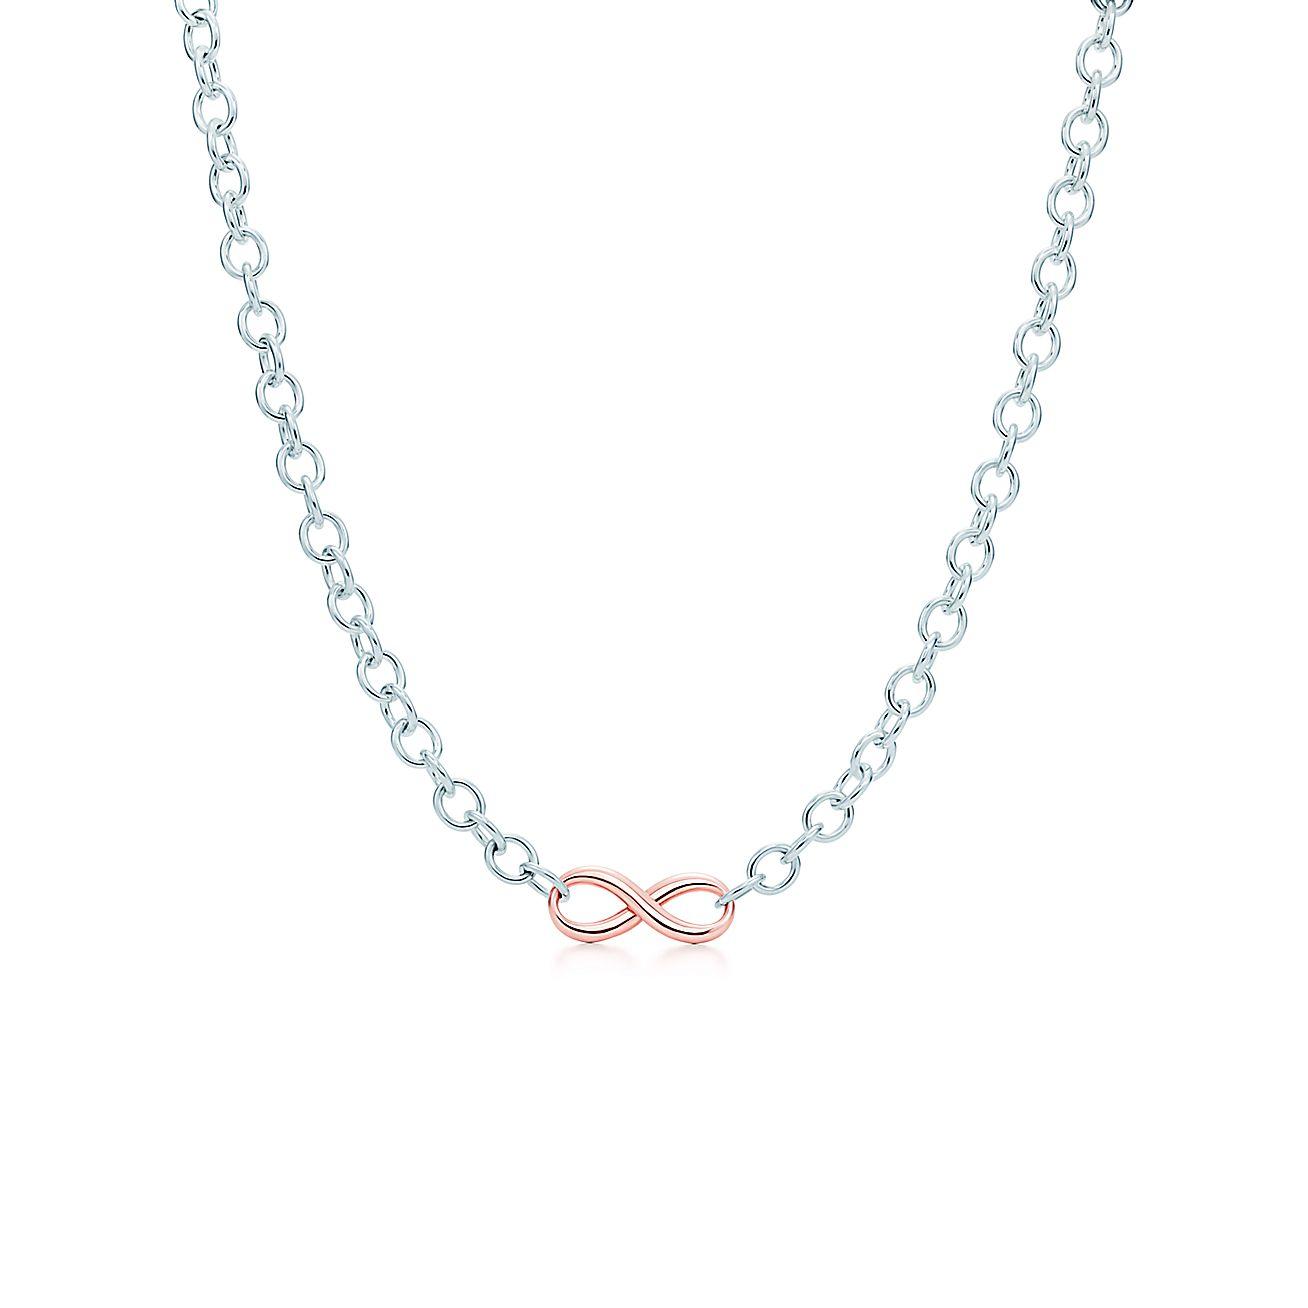 Tiffany Infinity:Necklace